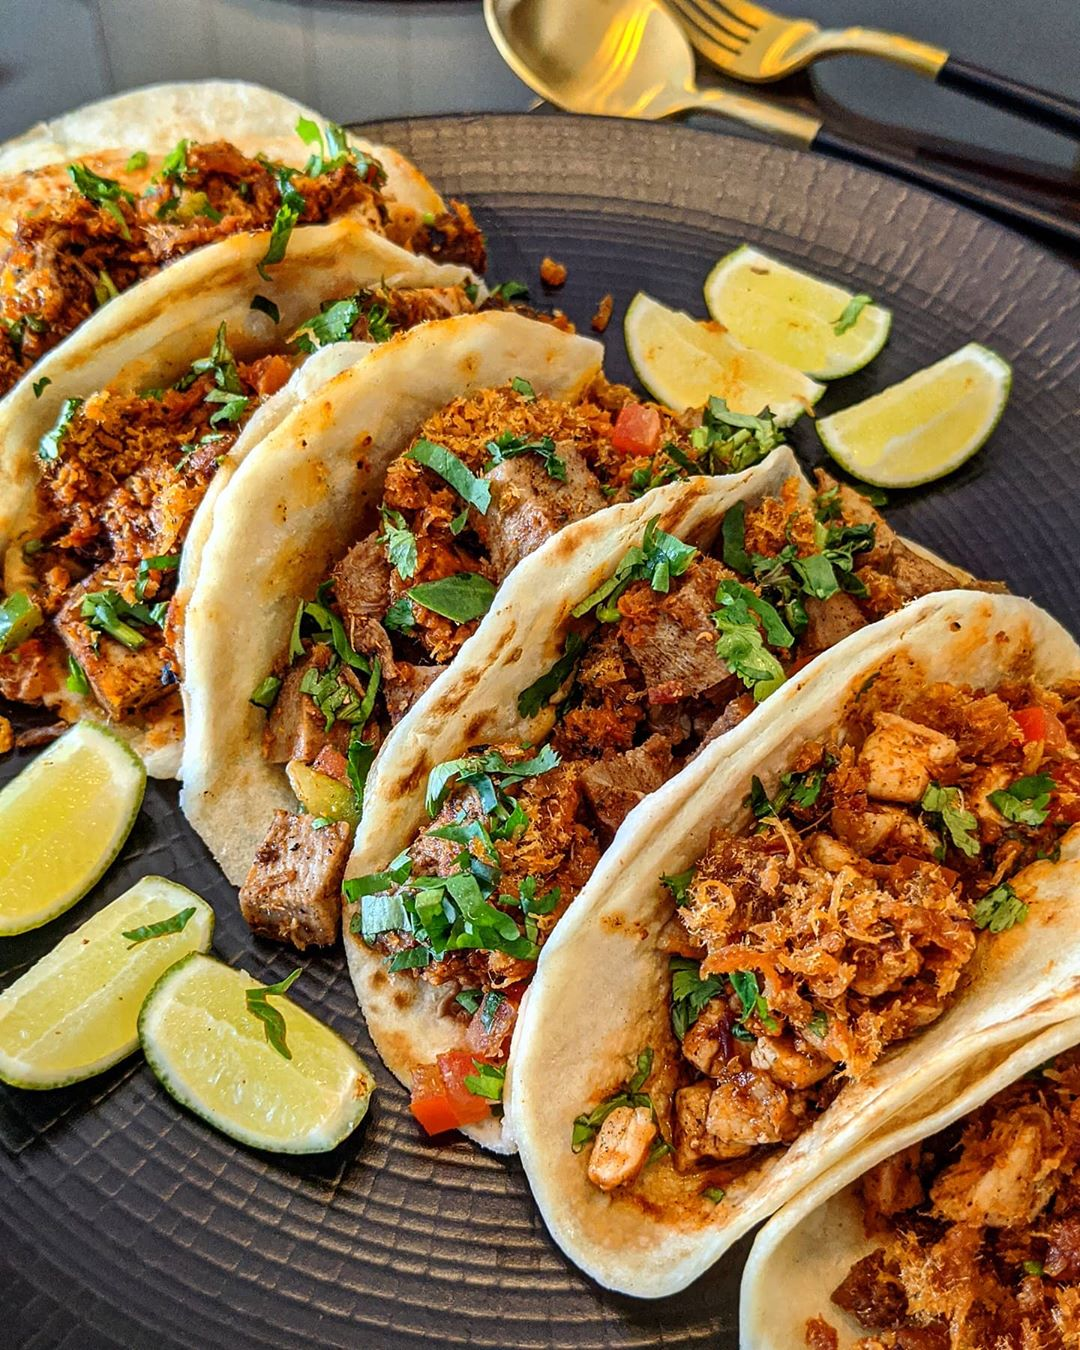 4 Rekomendasi Taco di Jakarta Bercita Rasa Autentik dan Unik